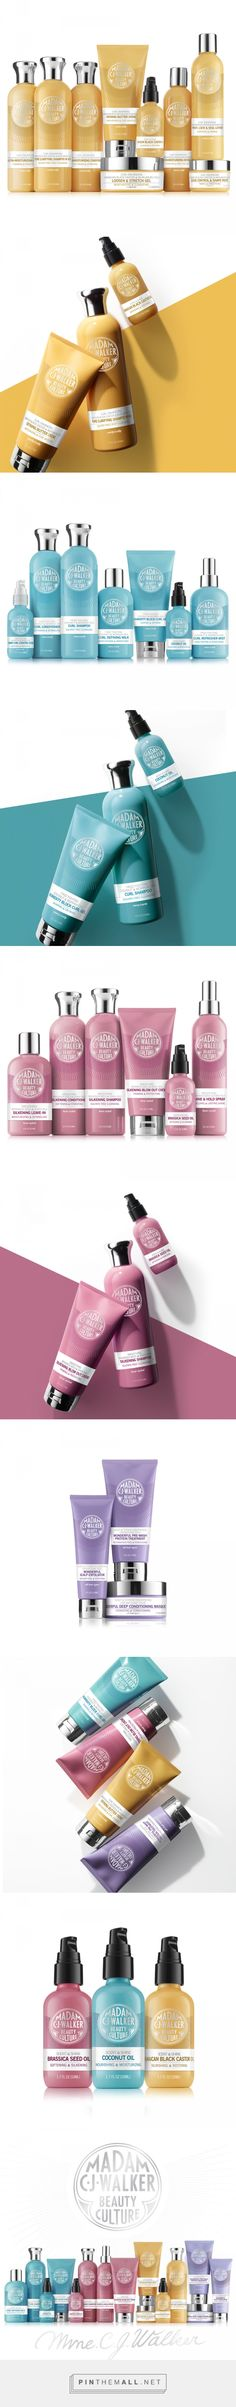 Madam CJ Walker Beauty Culture Packaging by Rooknyc | Fivestar Branding Agency – Design and Branding Agency & Inspiration Gallery